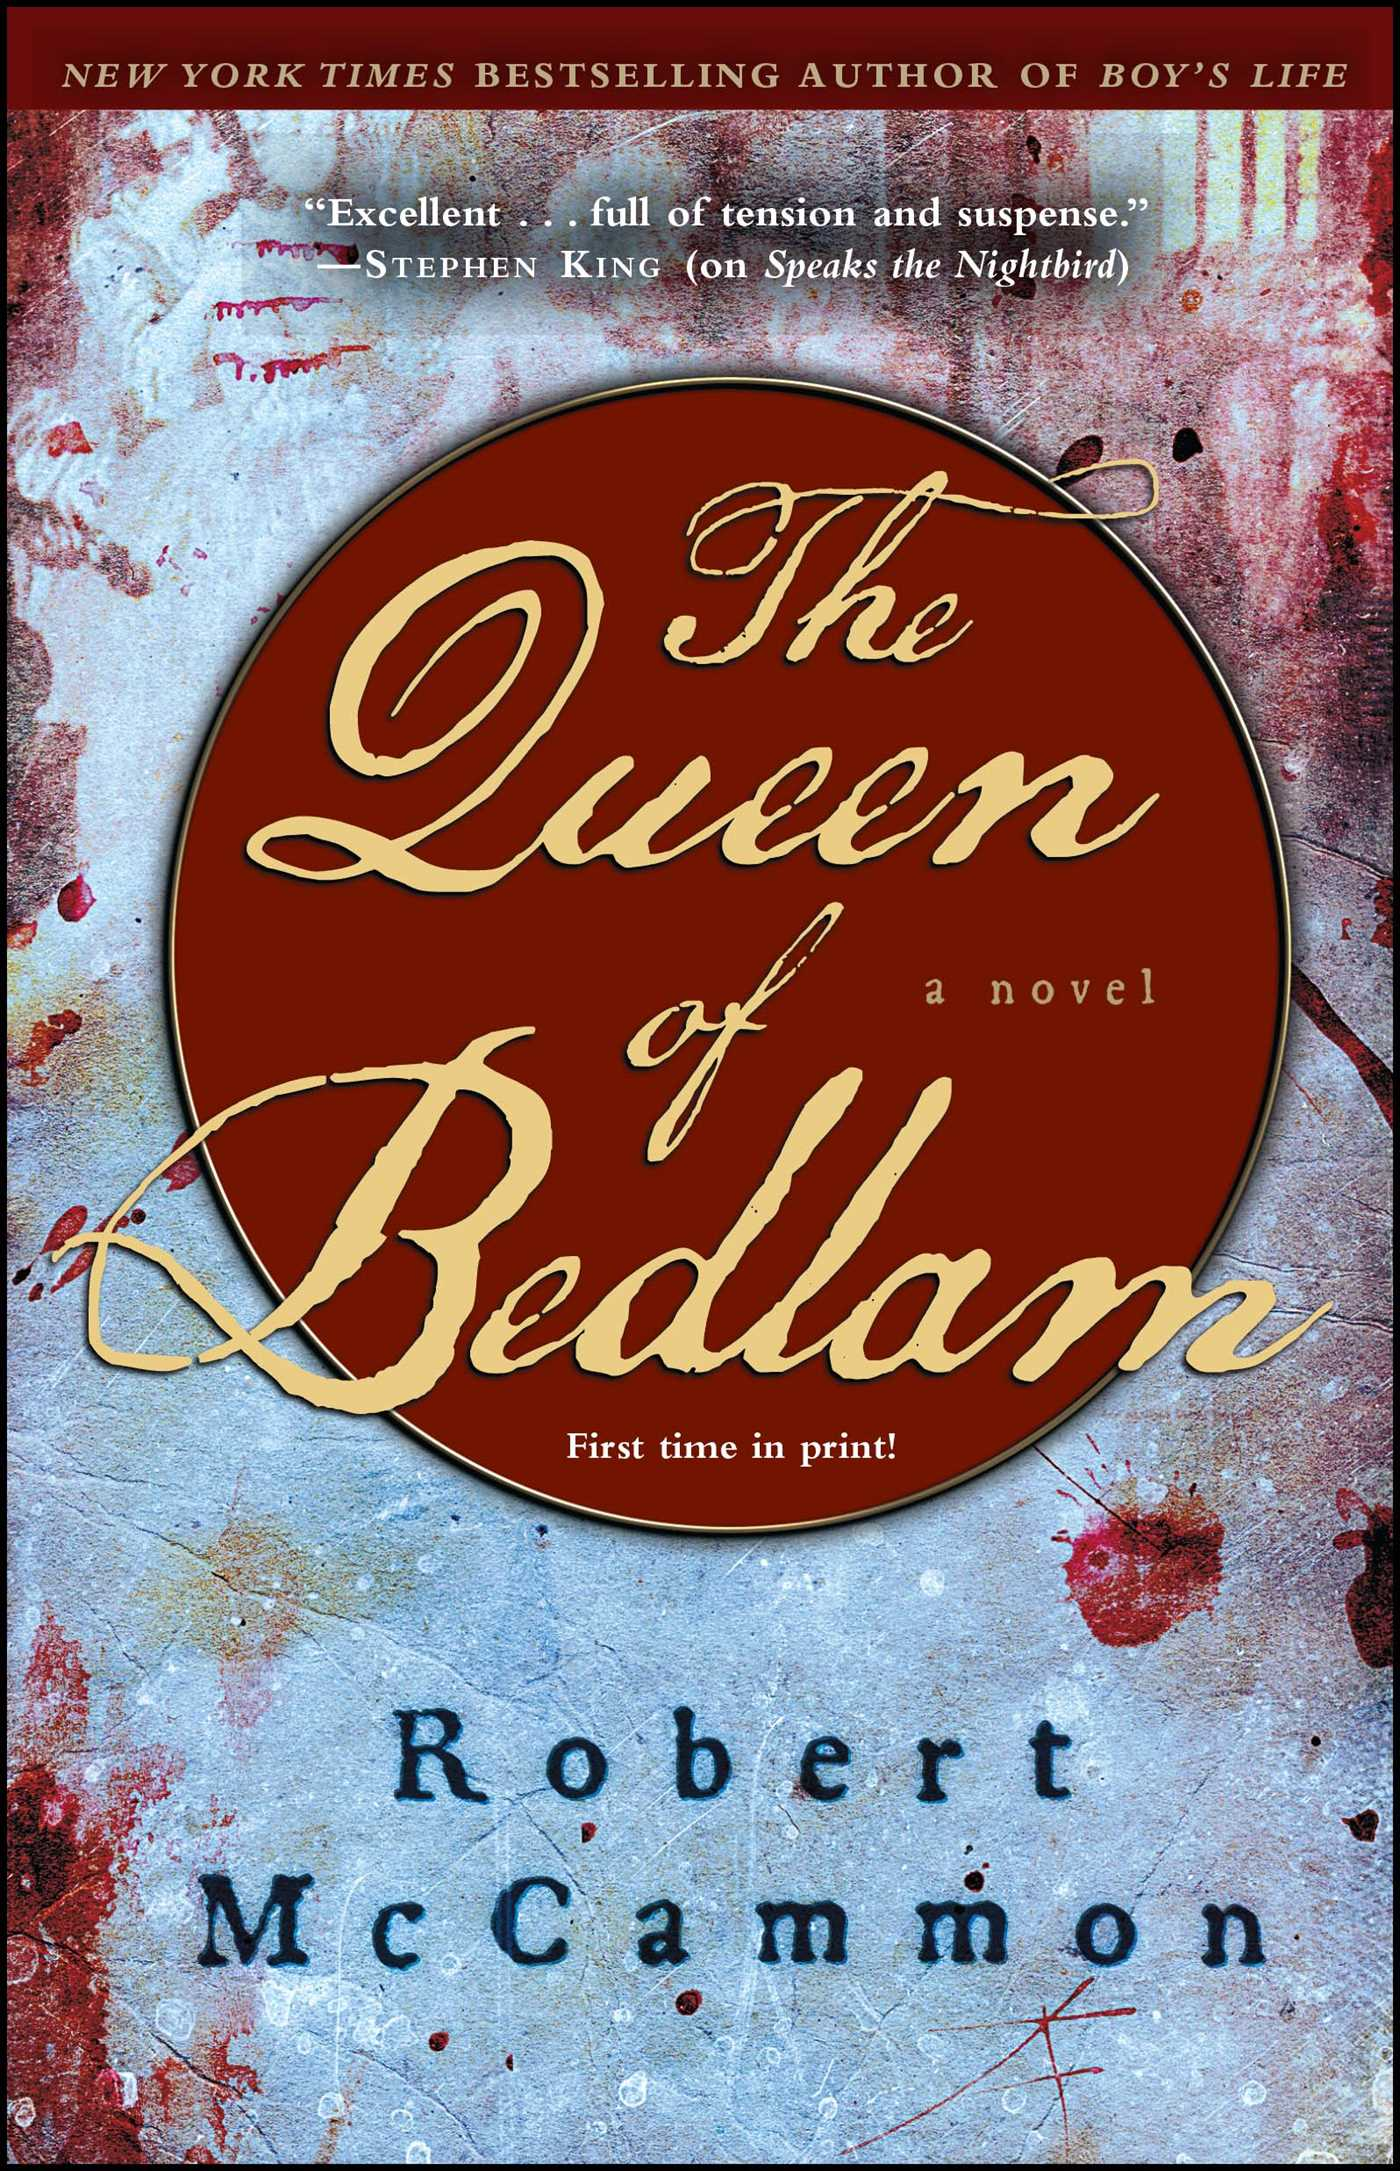 The Queen of Bedlam | Book by Robert McCammon | Official